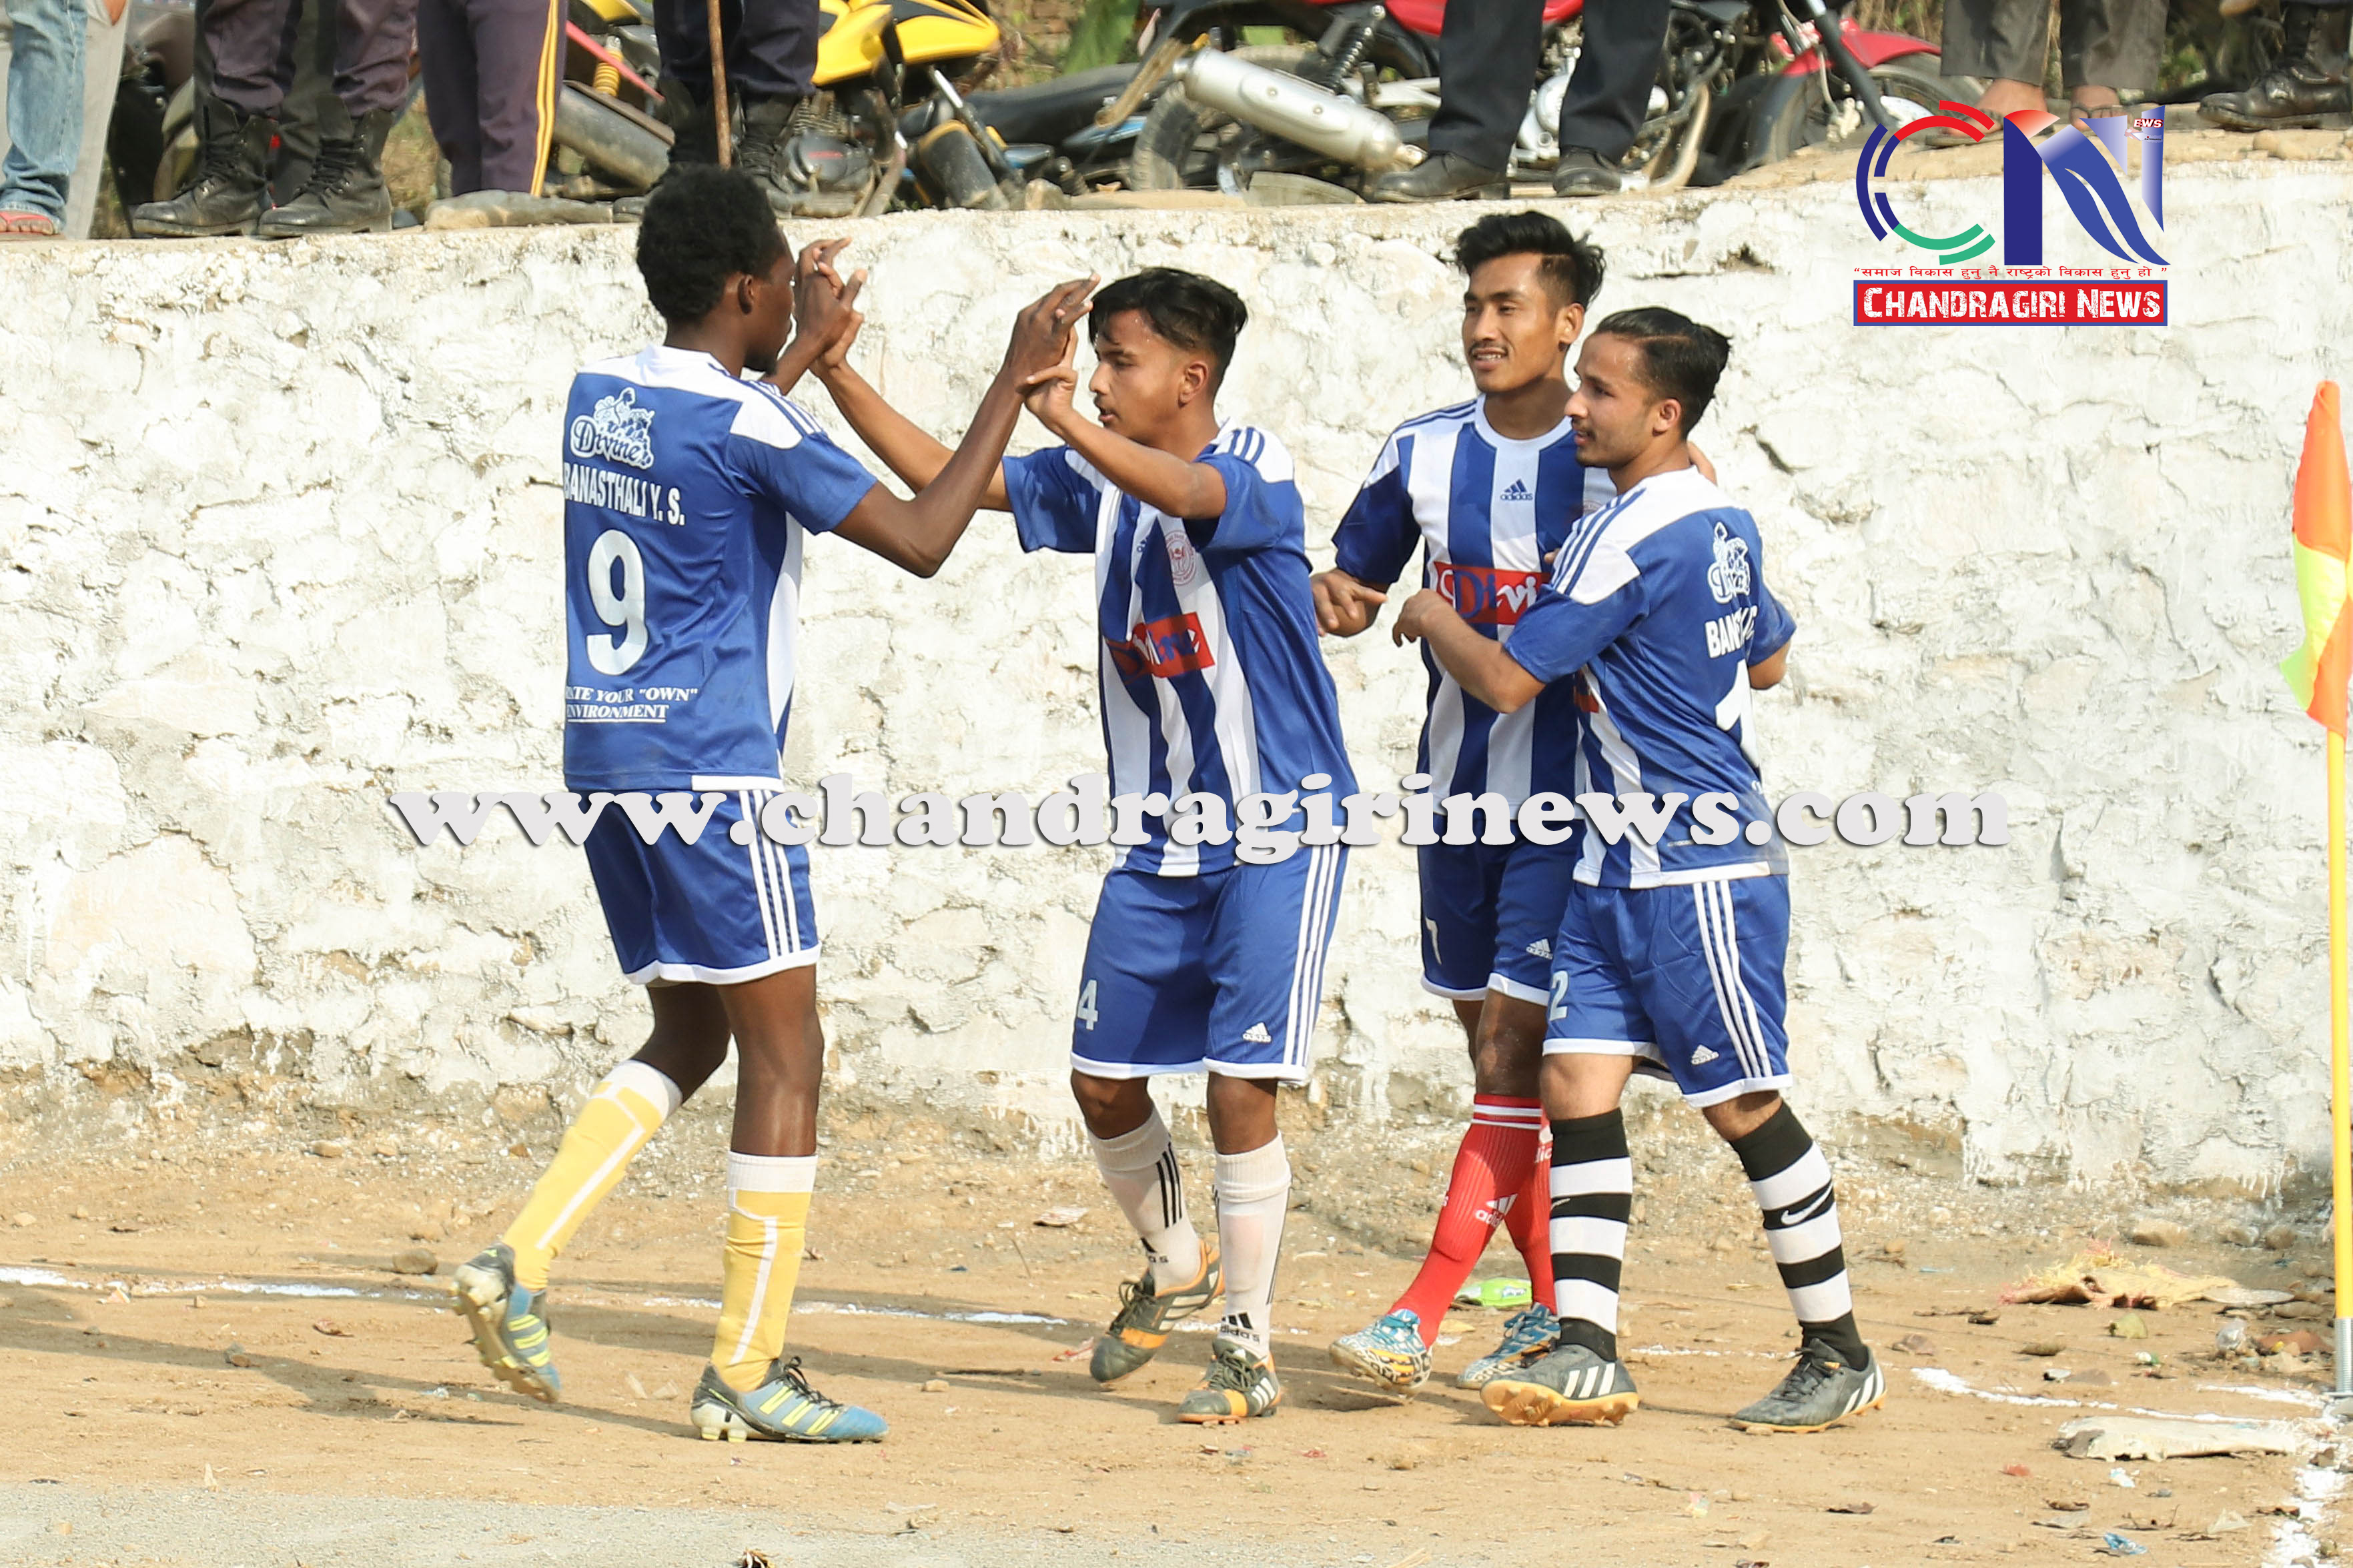 Chandragirinews western-united-first-game-9 चाैठाै  नेपाललय वईस्टन युनाईटेड क्लव फुटबल प्रतियाेगिता सुरू काठमाडौं किसीपिँडी खेलकुद थानकोट ब्रेकिंग न्युज महादेव स्थान मातातिर्थ मुख्य    chandragiri